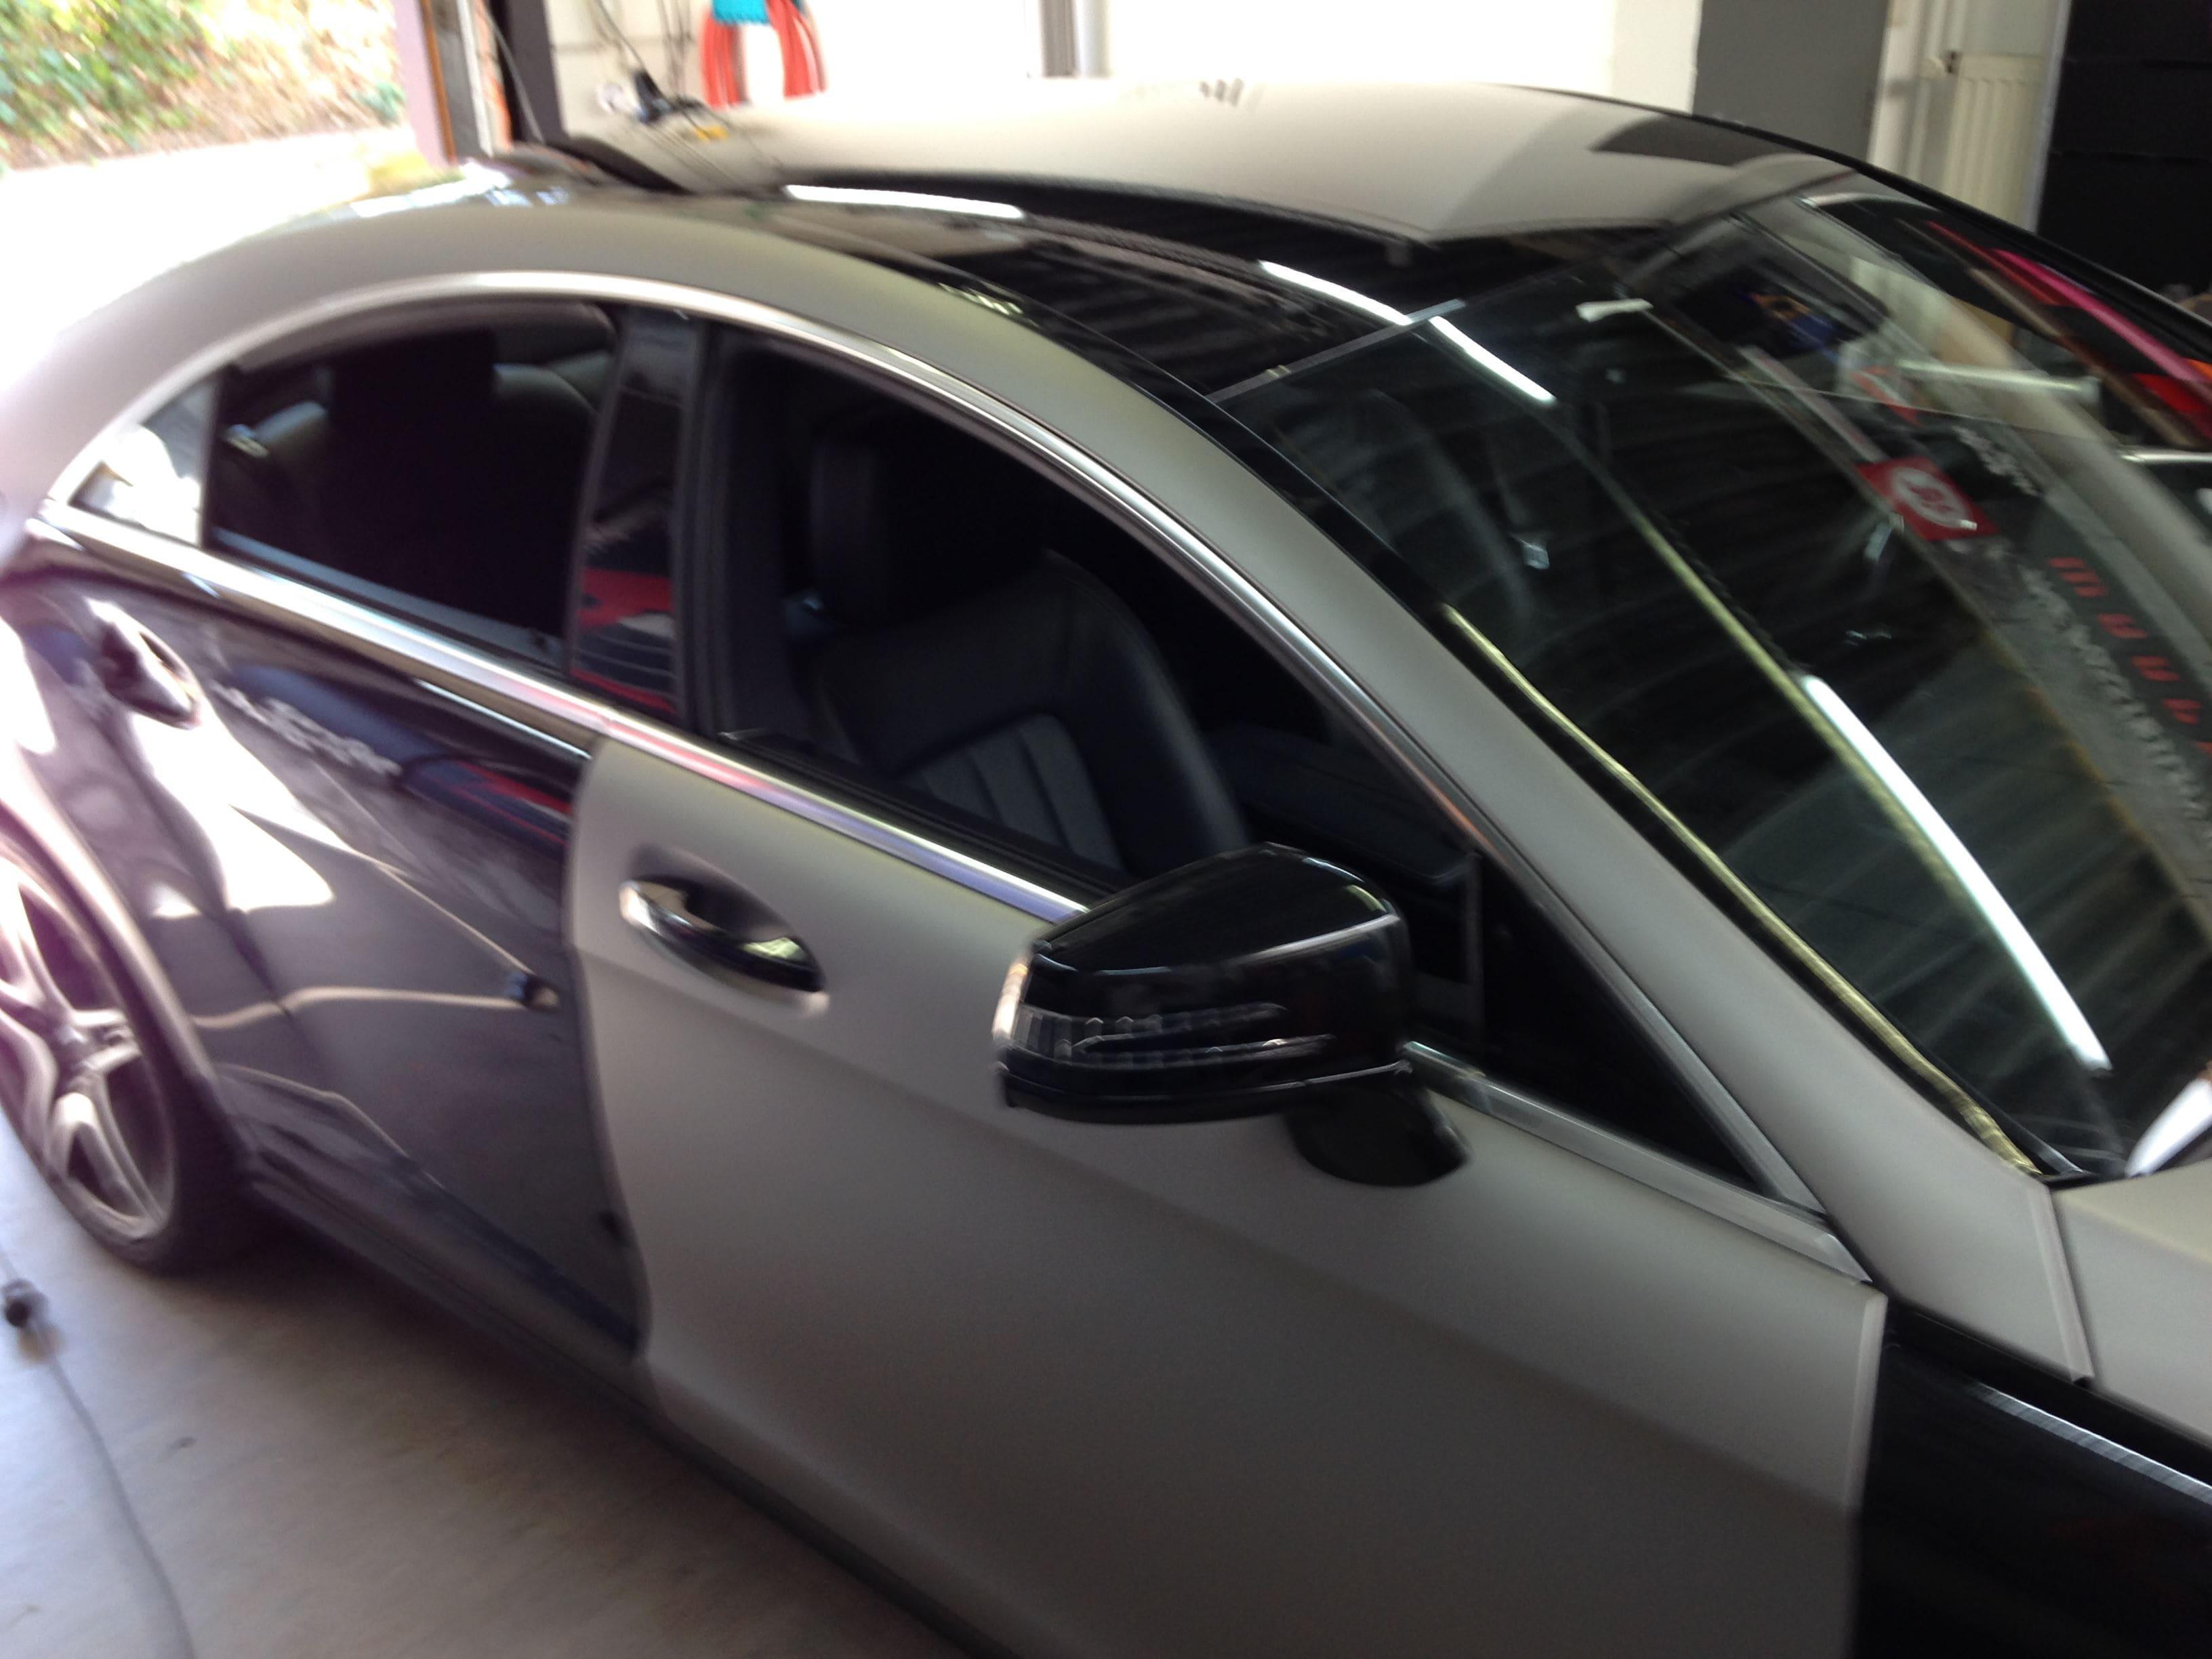 Mercedes CLS met Mat Grey Aluminium Wrap, Carwrapping door Wrapmyride.nu Foto-nr:6132, ©2020